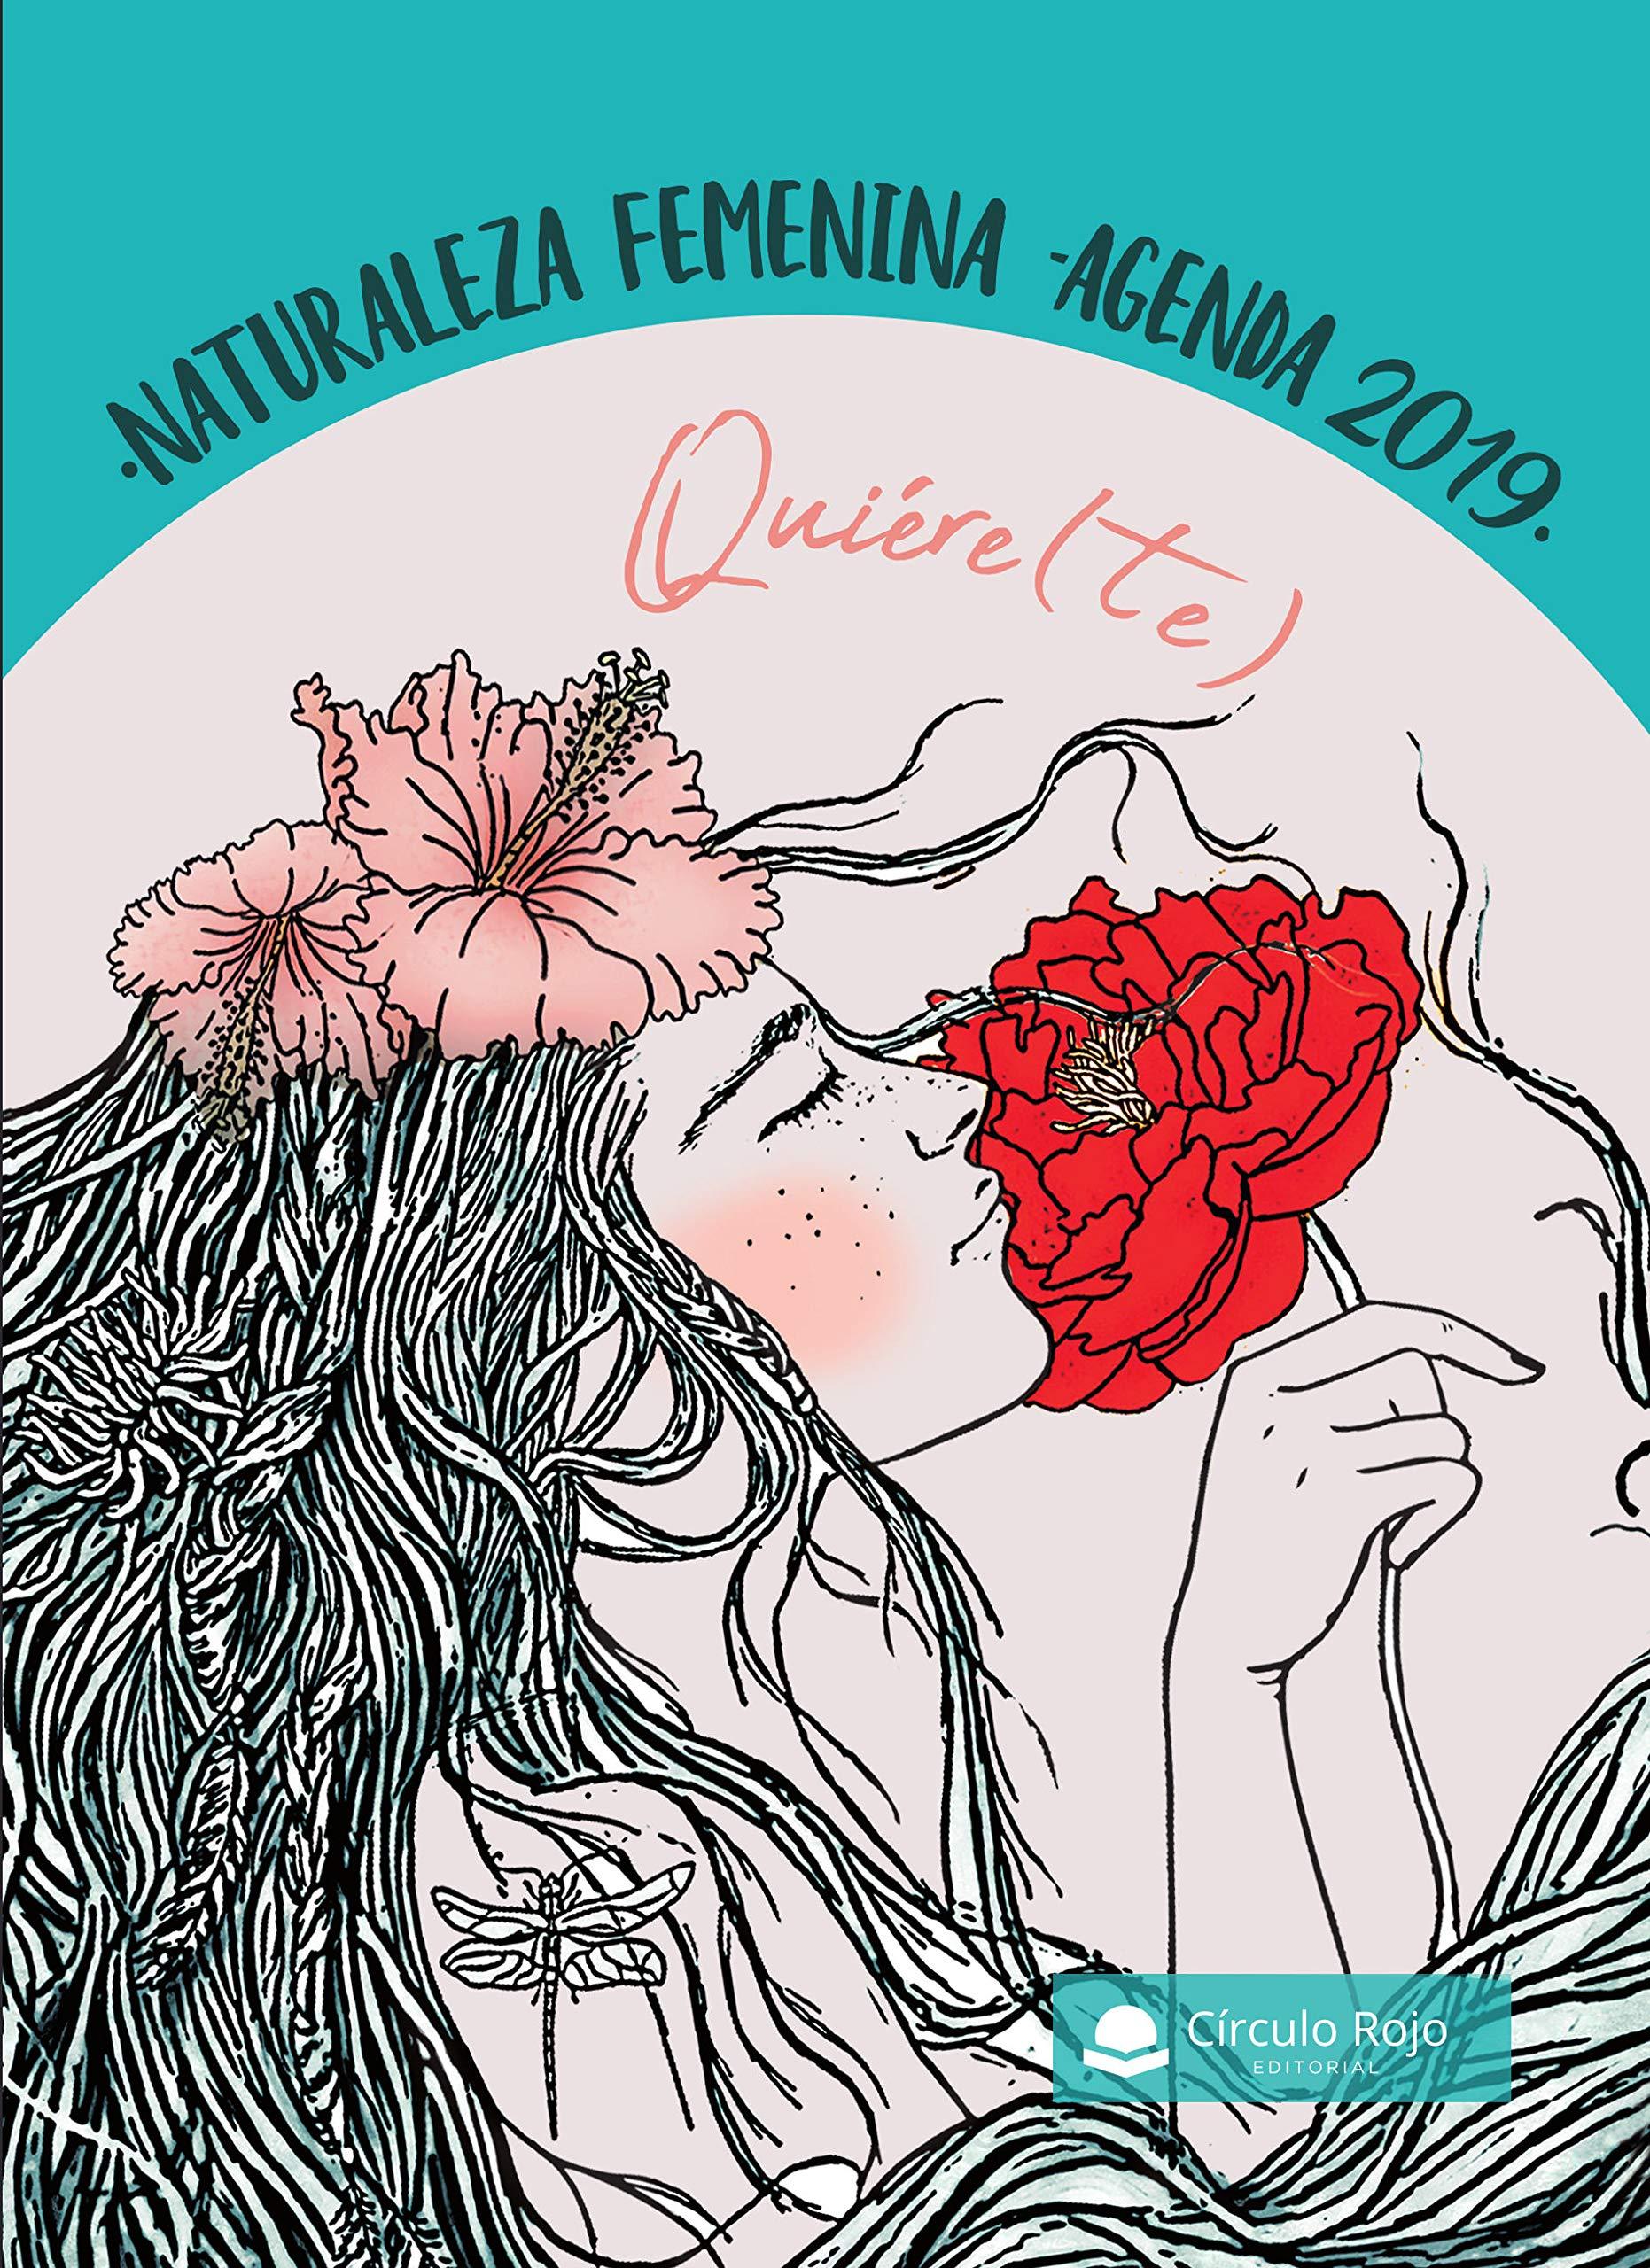 Quiére(te) ¡Mucho!: Naturaleza femenina agenda 2019: Amazon ...